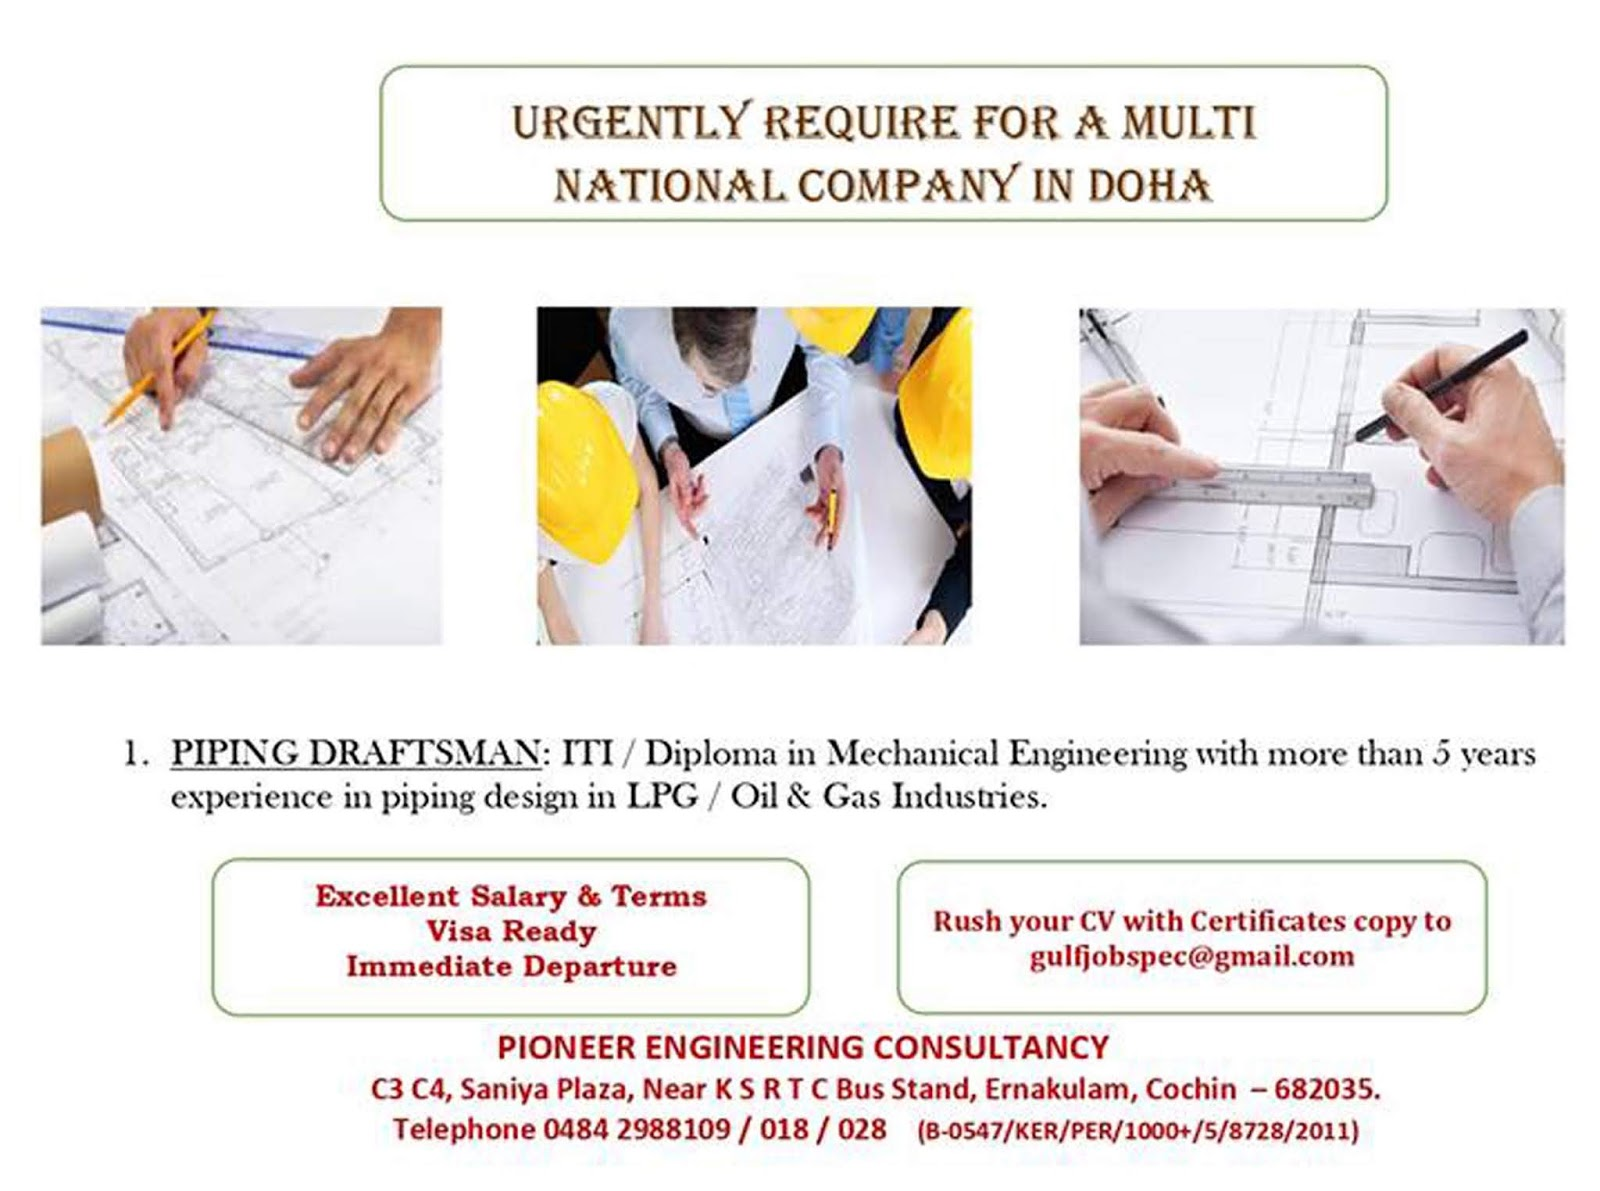 Piping Draftsman for Multi National Company in Doha Qatar